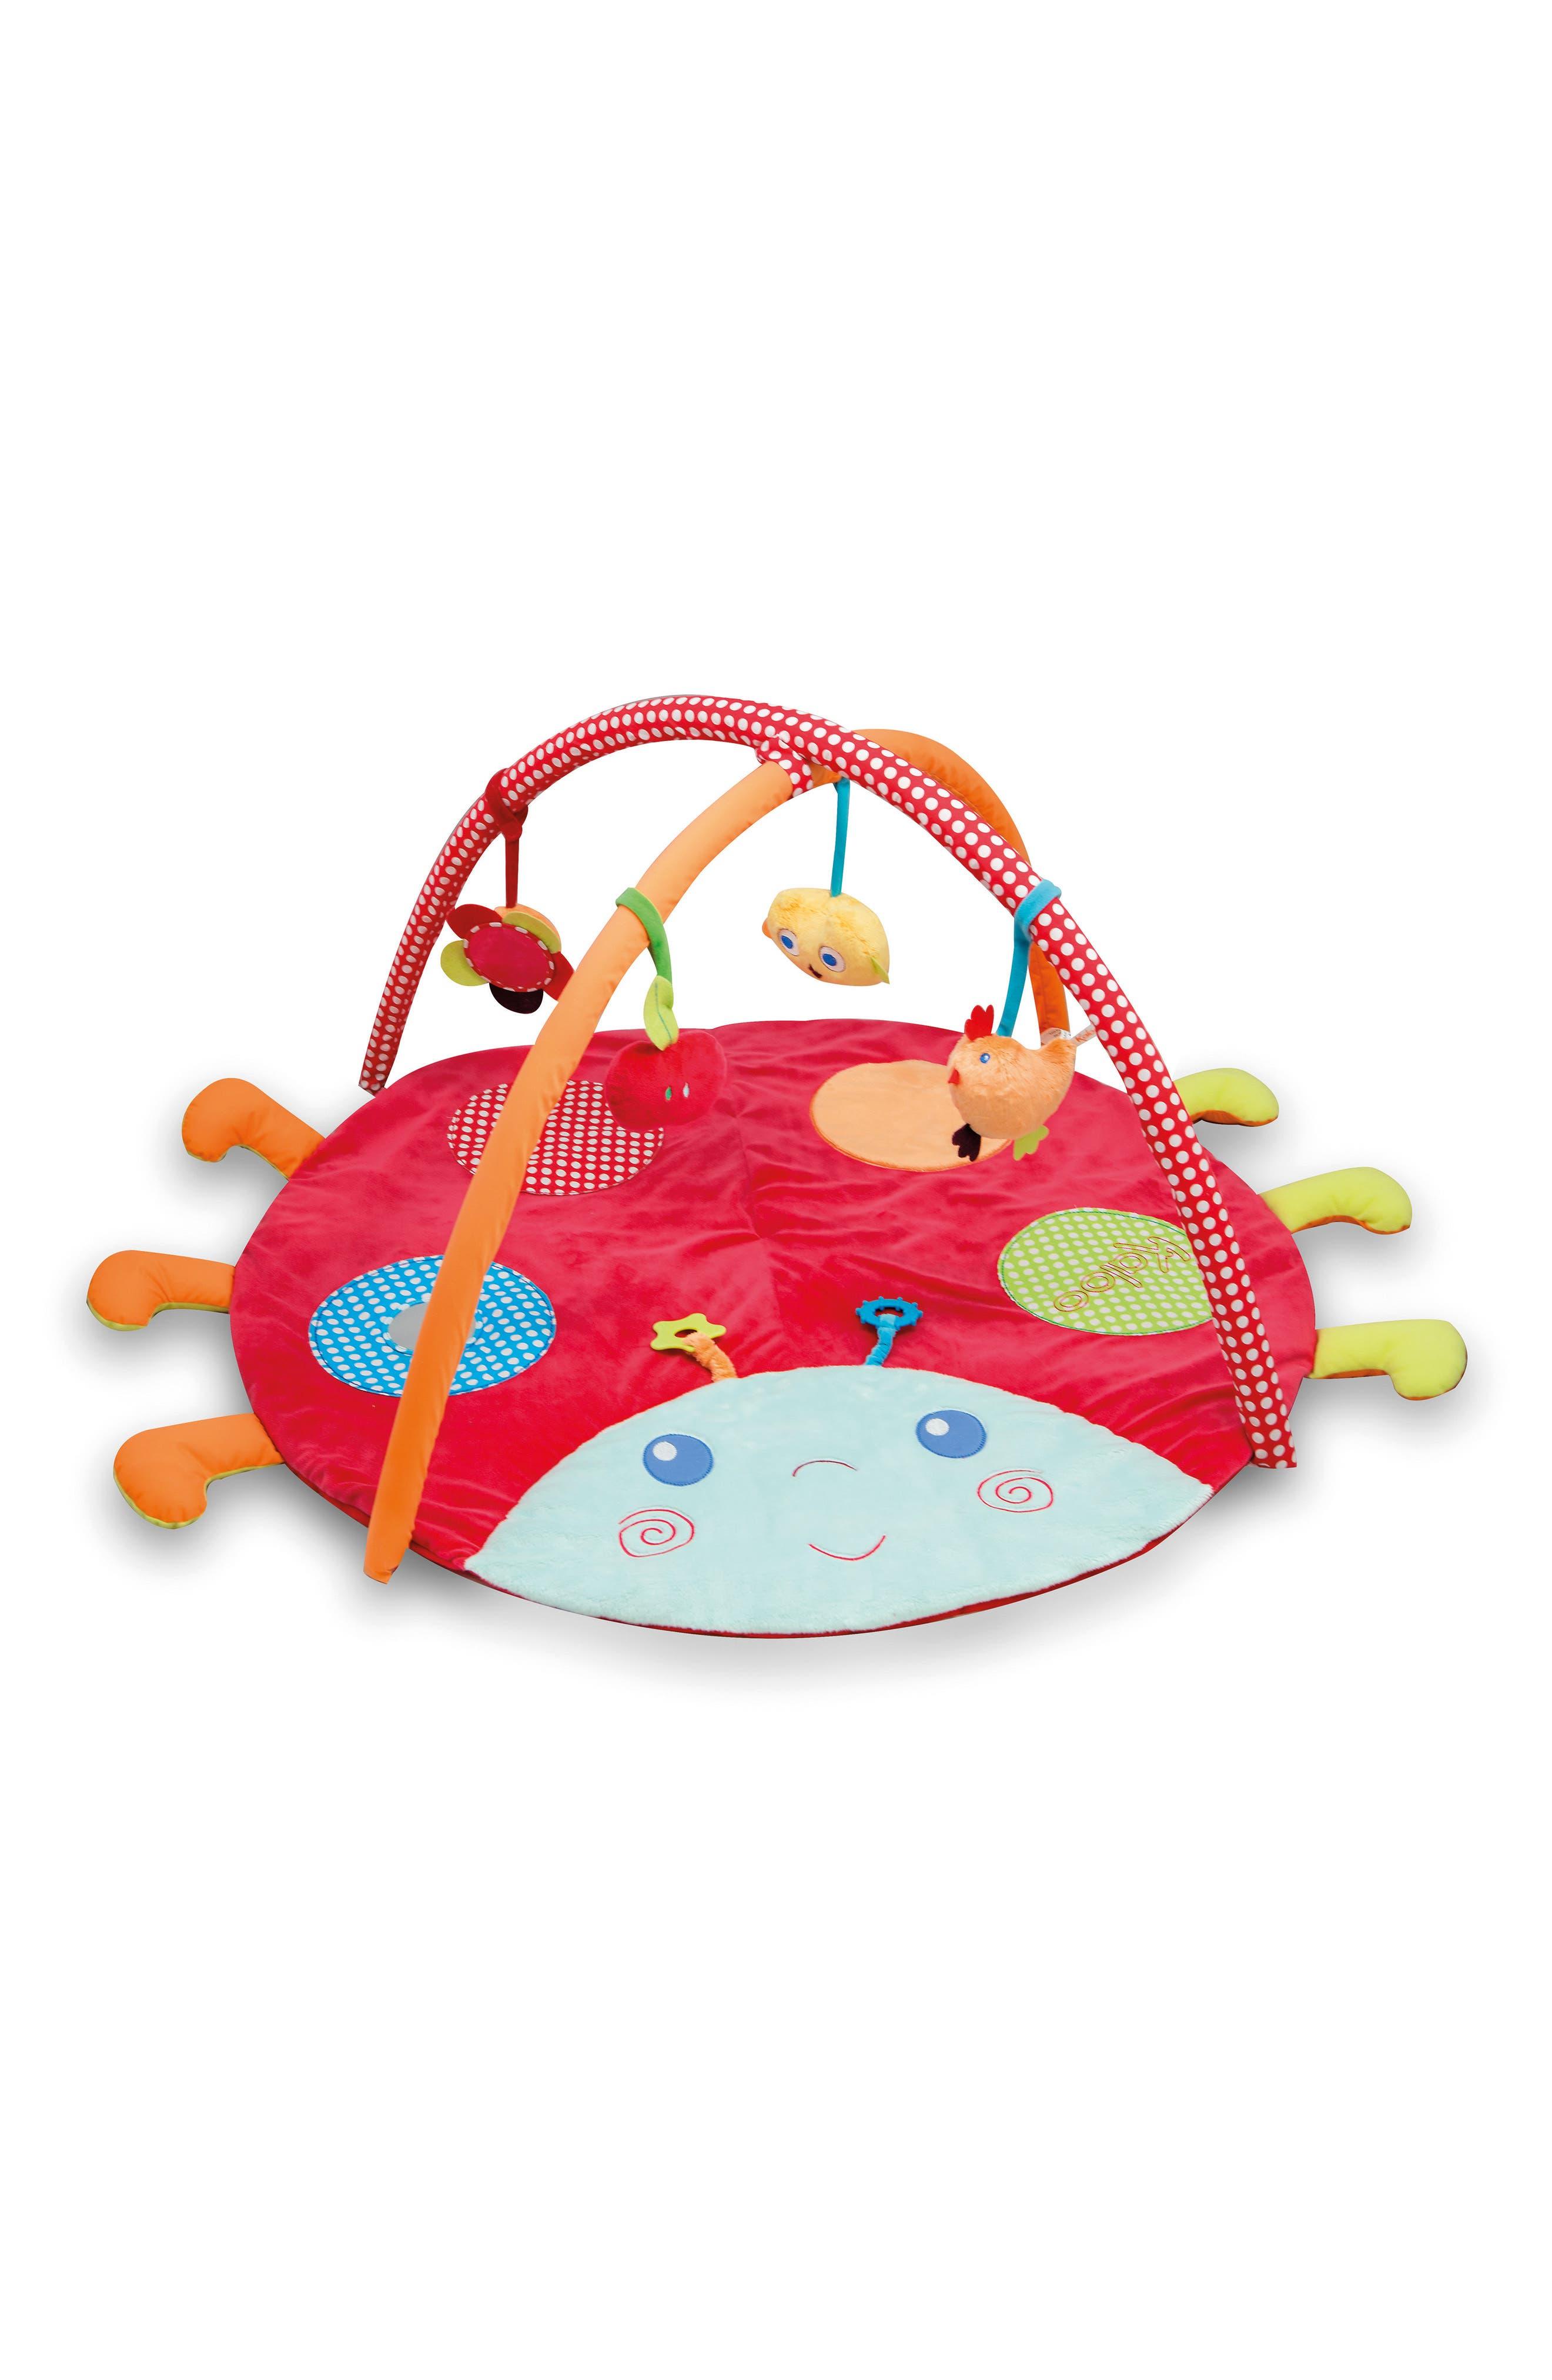 Ladybug Play Mat,                         Main,                         color, Multi